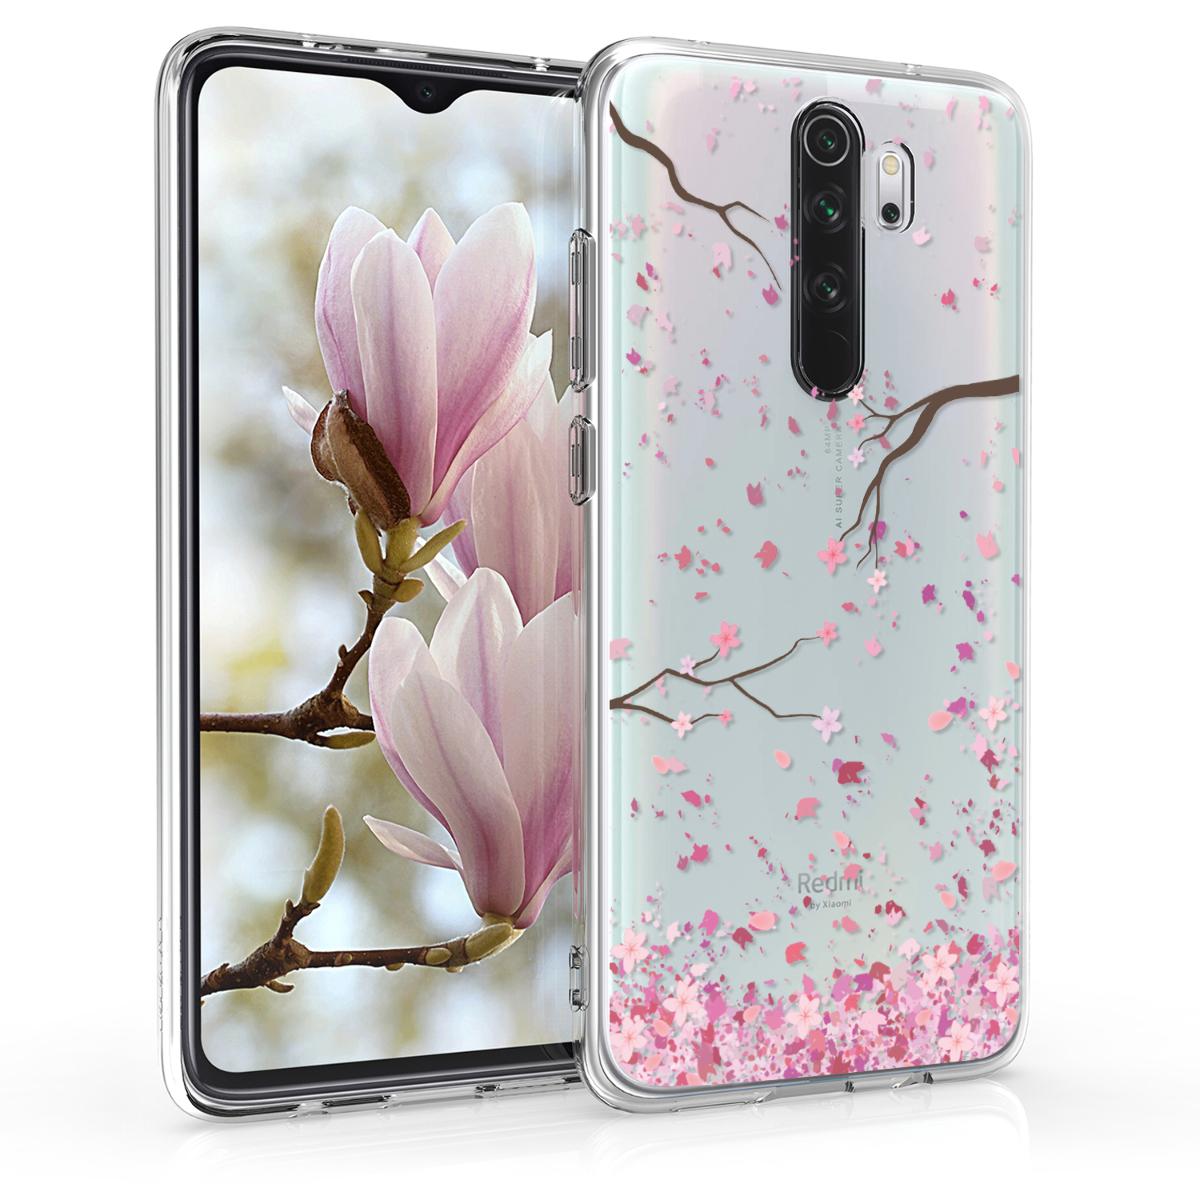 KW Θήκη Σιλικόνης Xiaomi Redmi Note 8 Pro - Cherry Blossoms - Light Pink / Dark Brown / Transparent (50244.05)